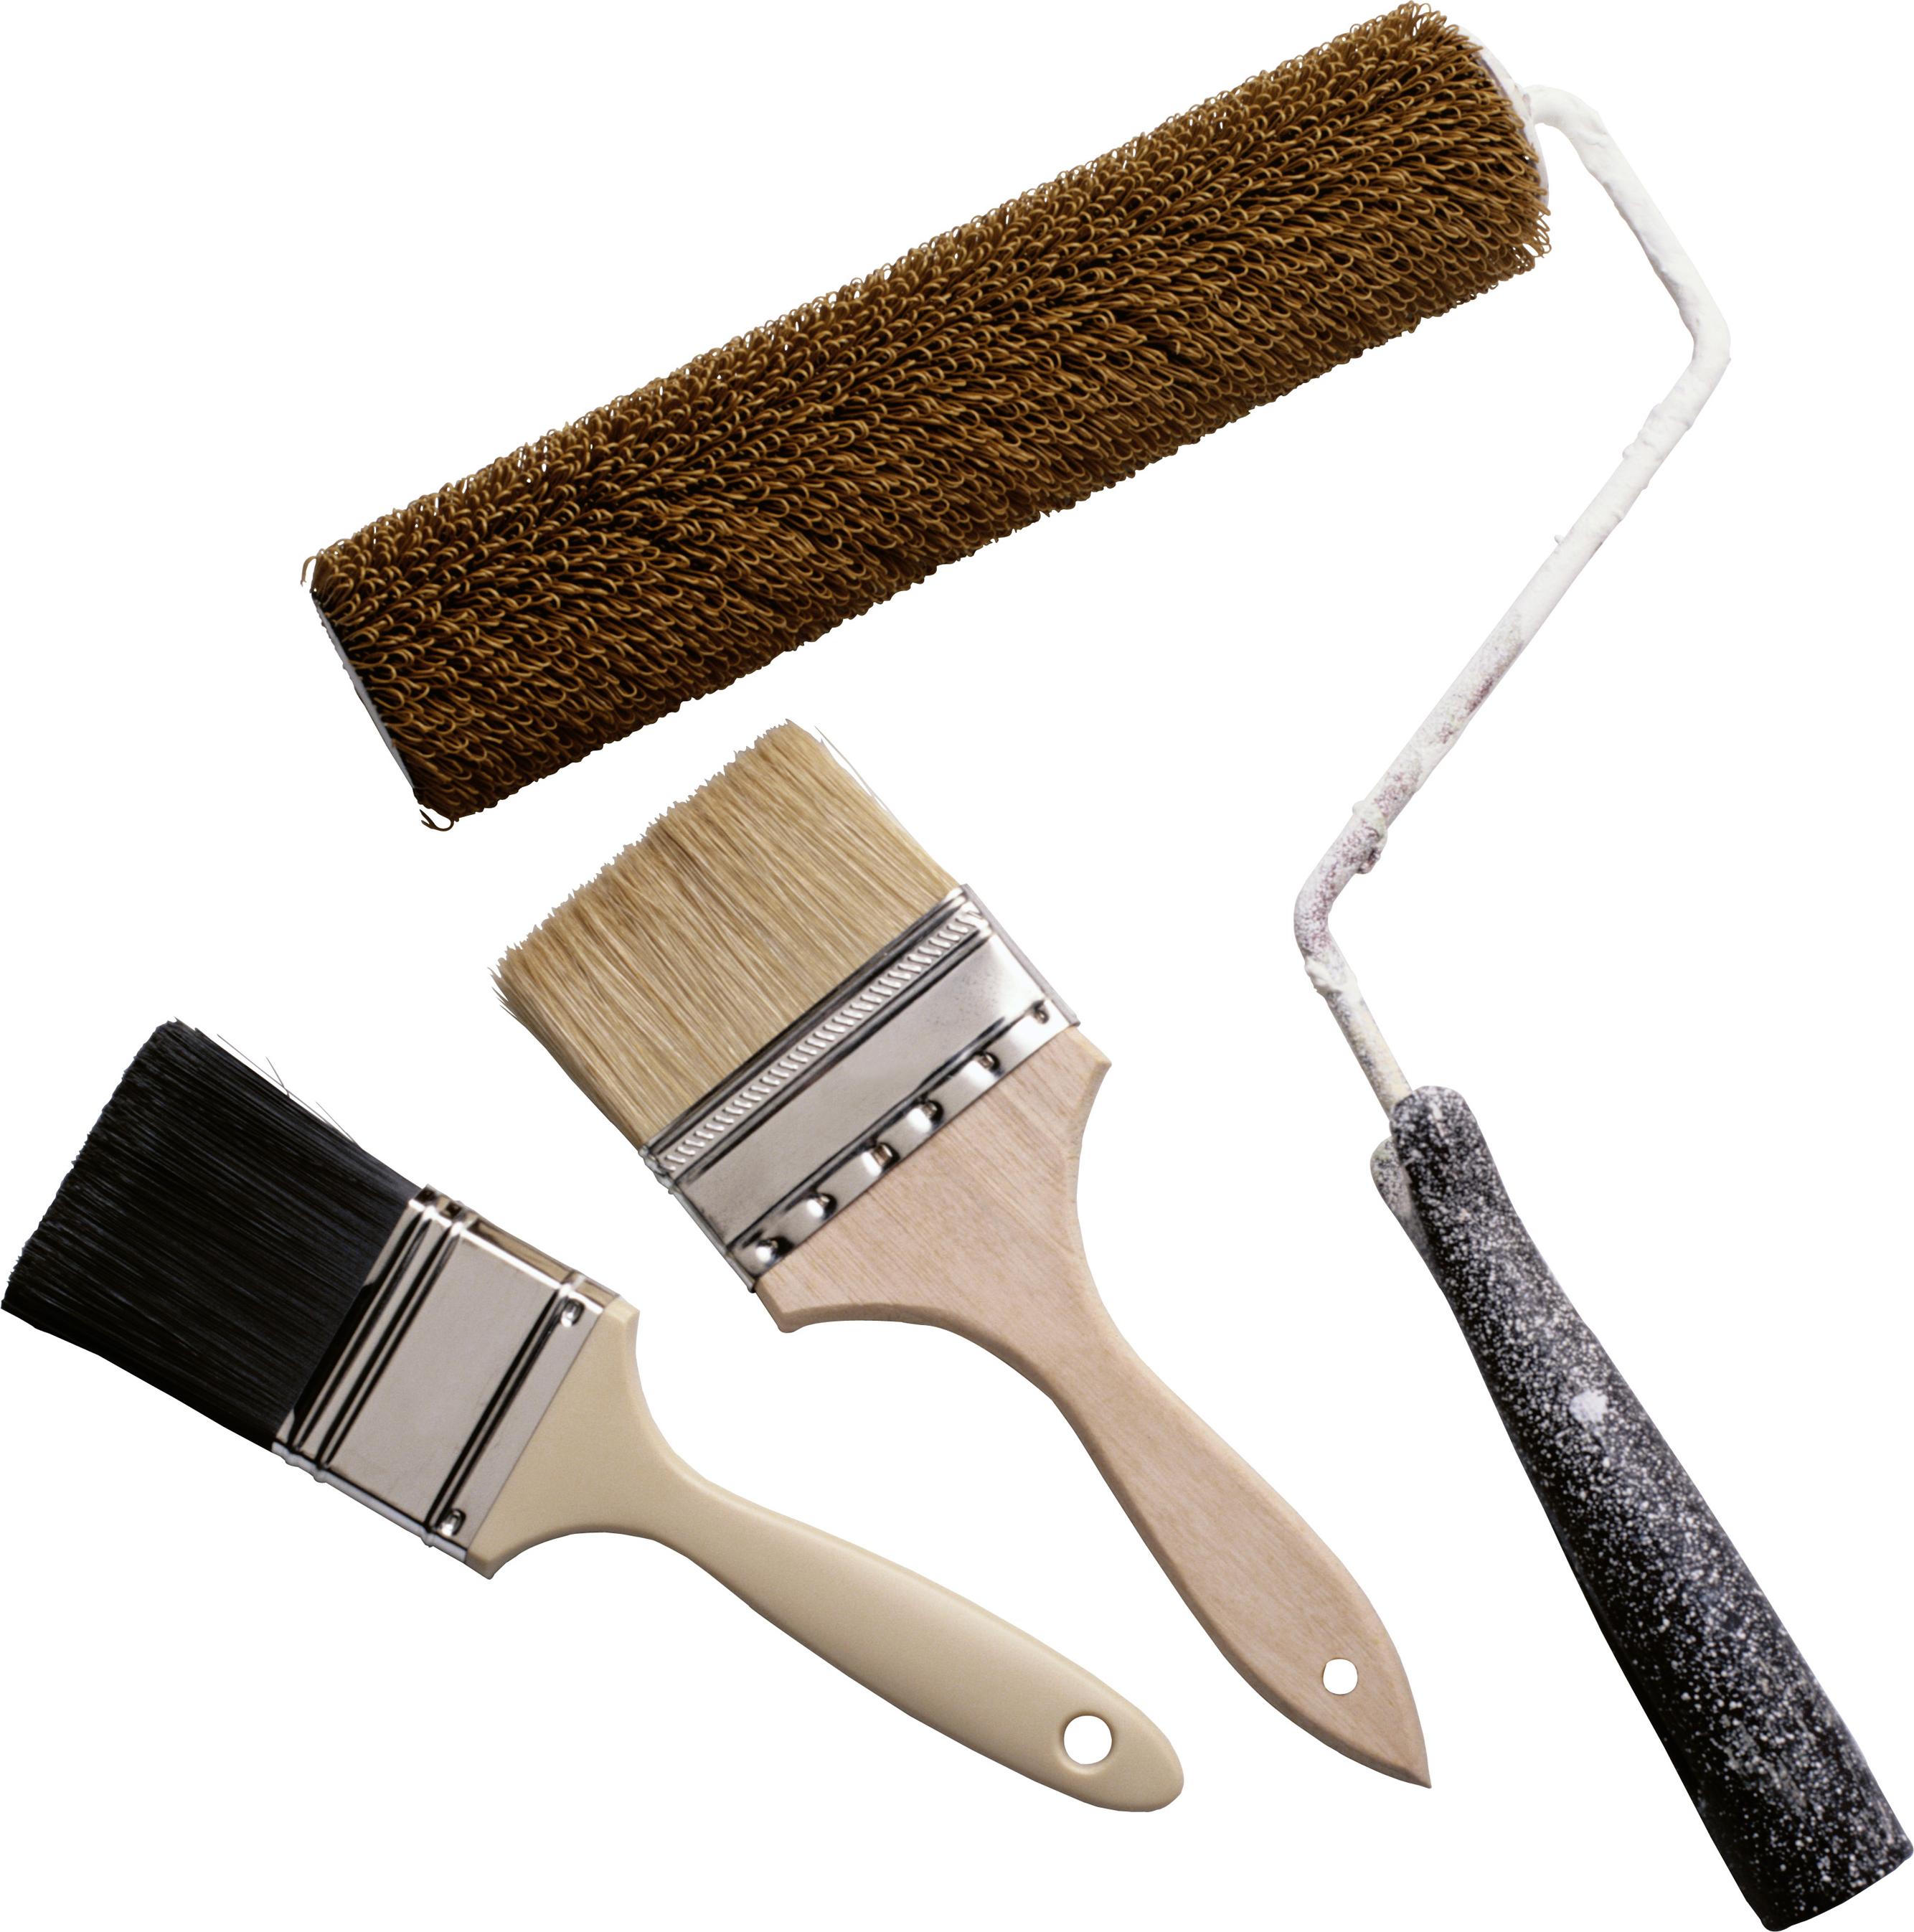 Paint Brush Png Image Paint Brushes Brush Painting